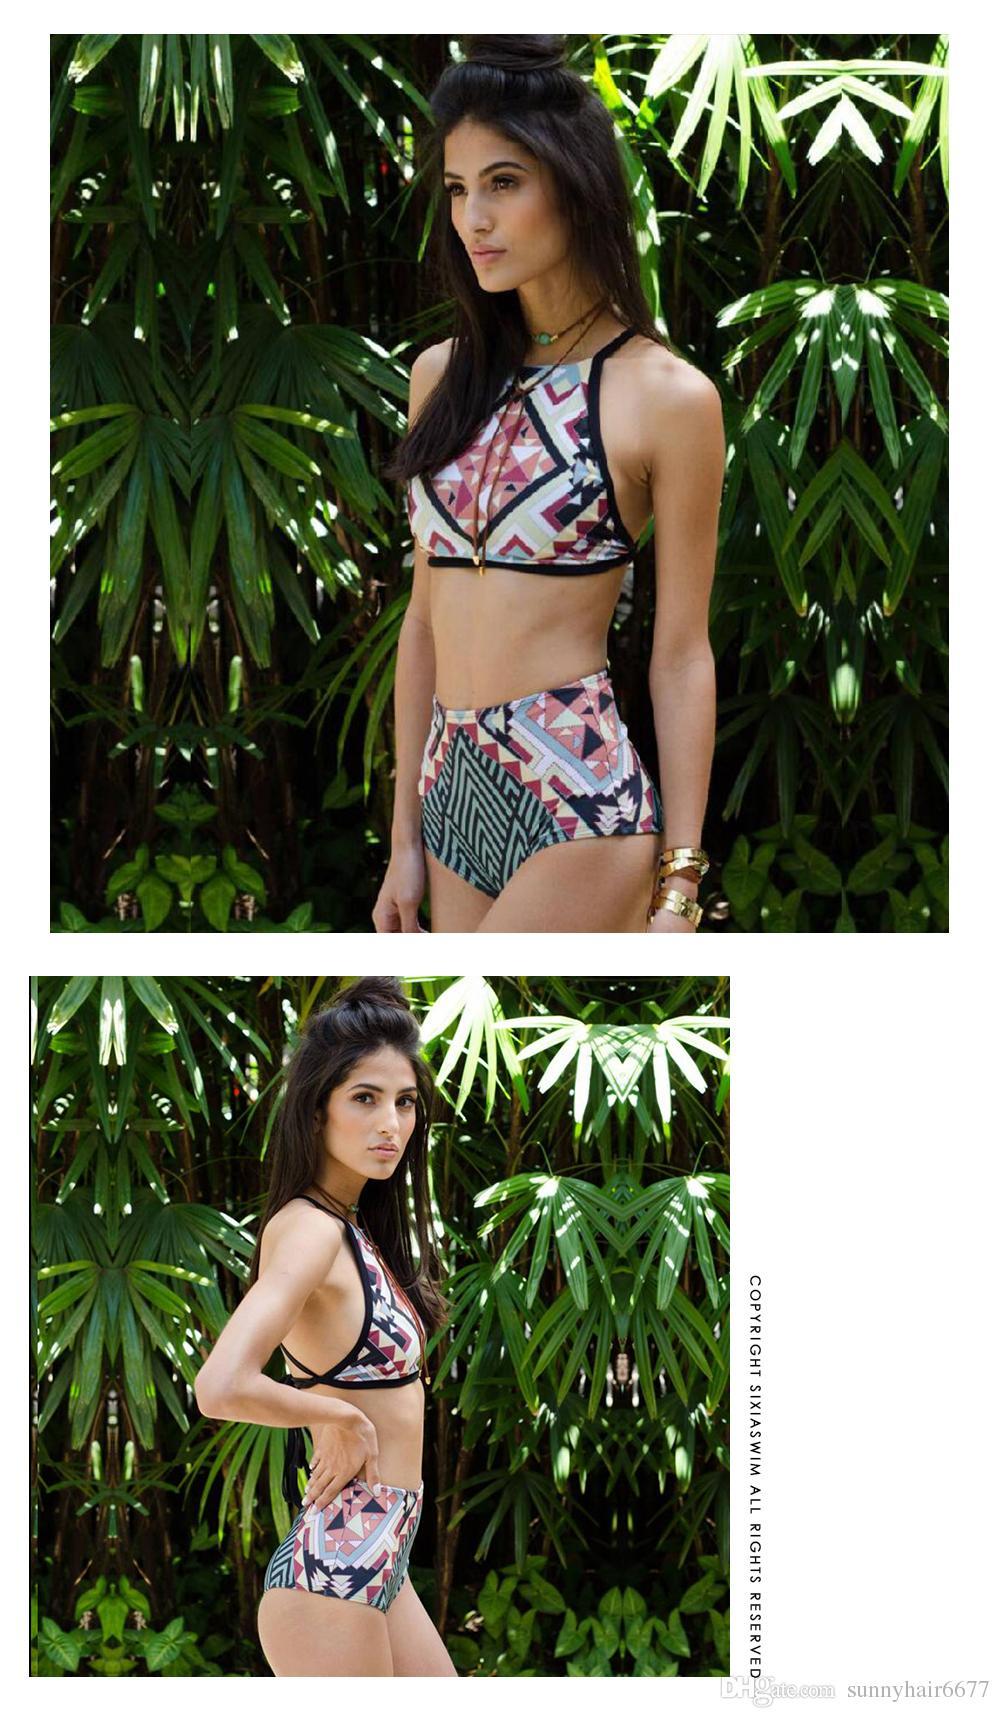 Dark Blue Print Floral Hight Waist Bikini Two Piece Striped Tankini Swimwear Women Sexy Female Swimsuit Brazilian Bikini XL 912